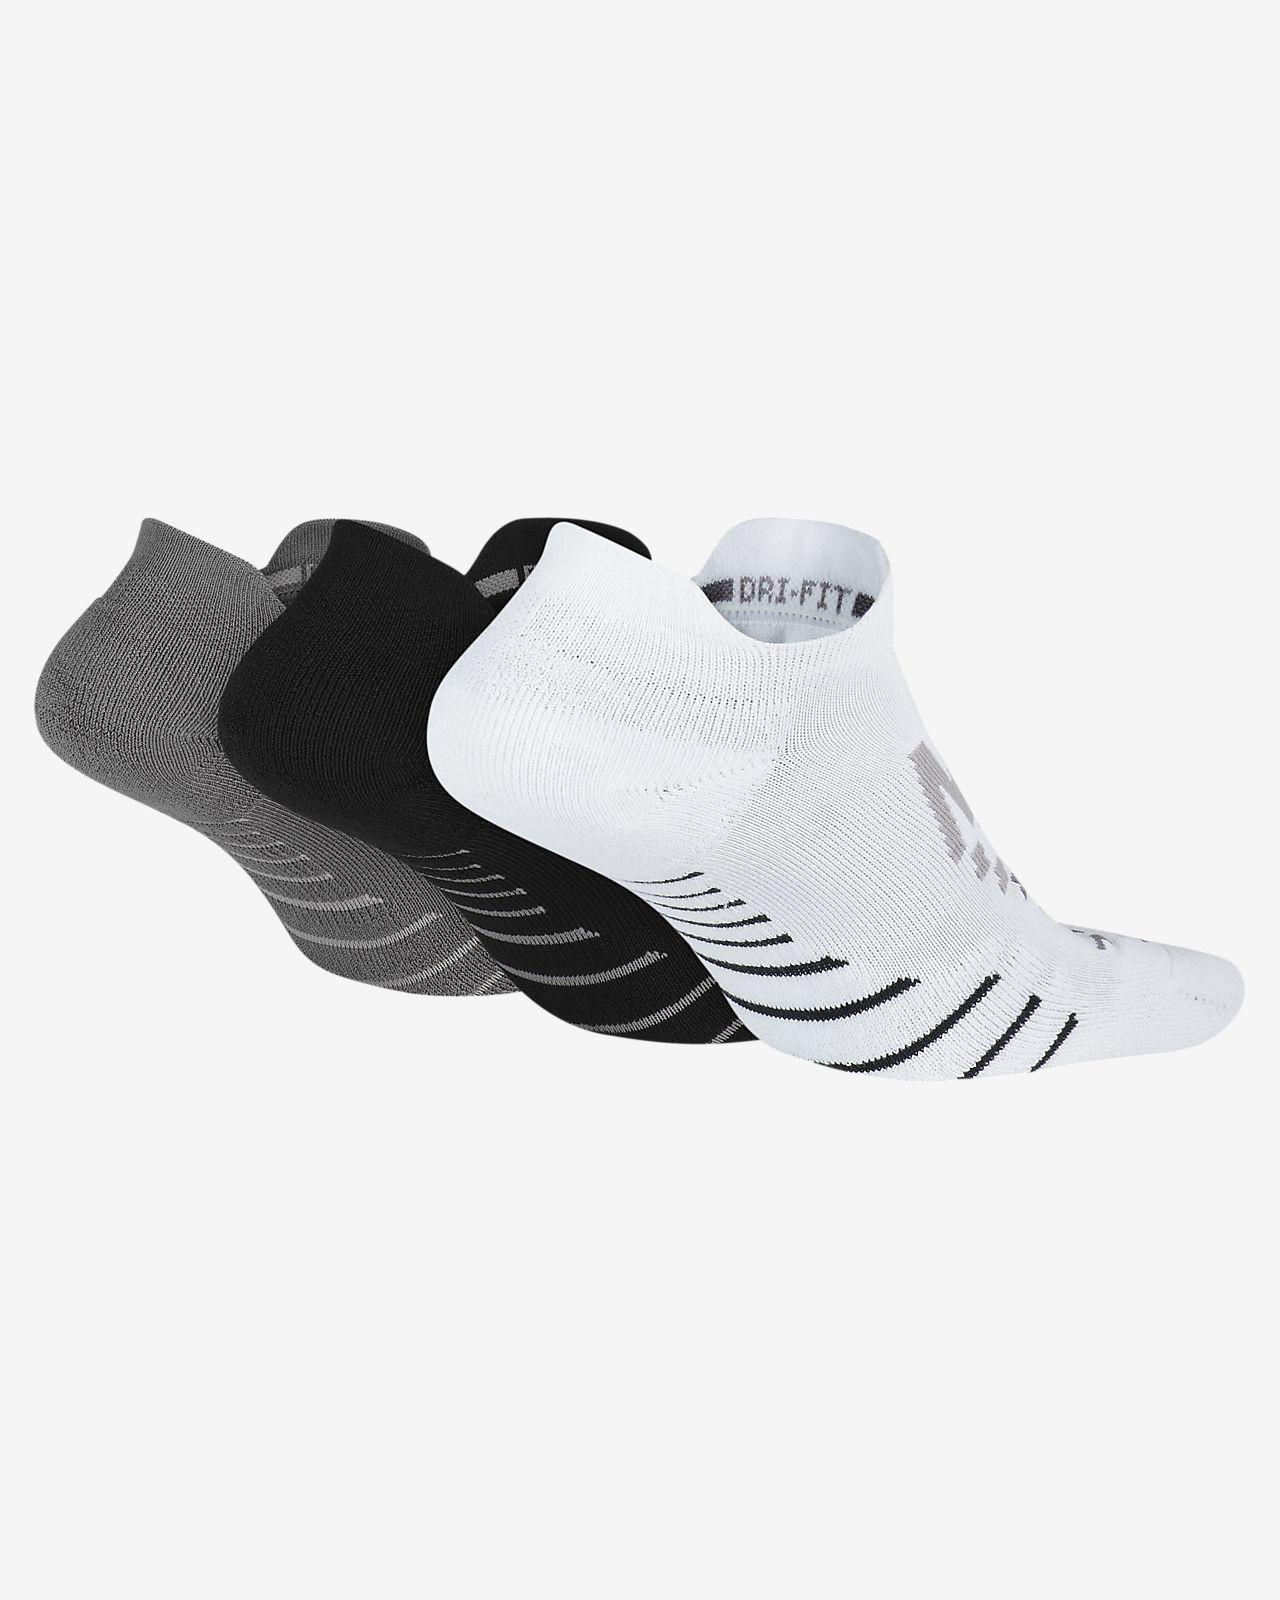 42b02d16dd Clothing Boys NIKE Kids Everyday Max Cushion No-Show Socks 3 Pairs